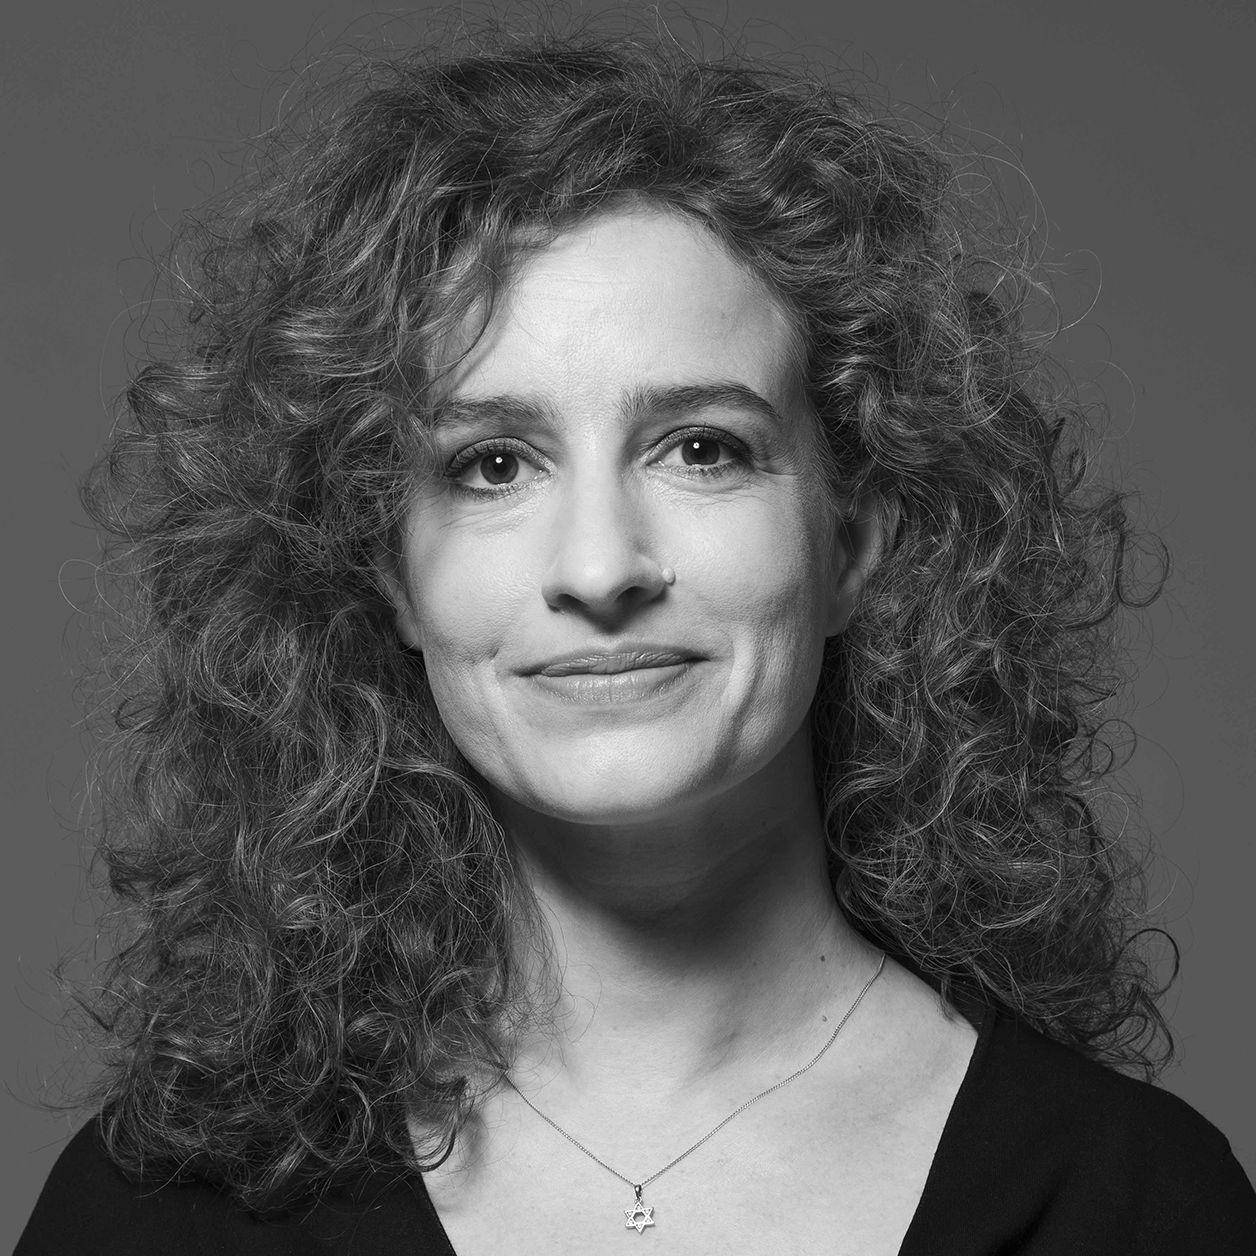 Zsofia Balatoni, Co-founder of Uniomedia in Hungary